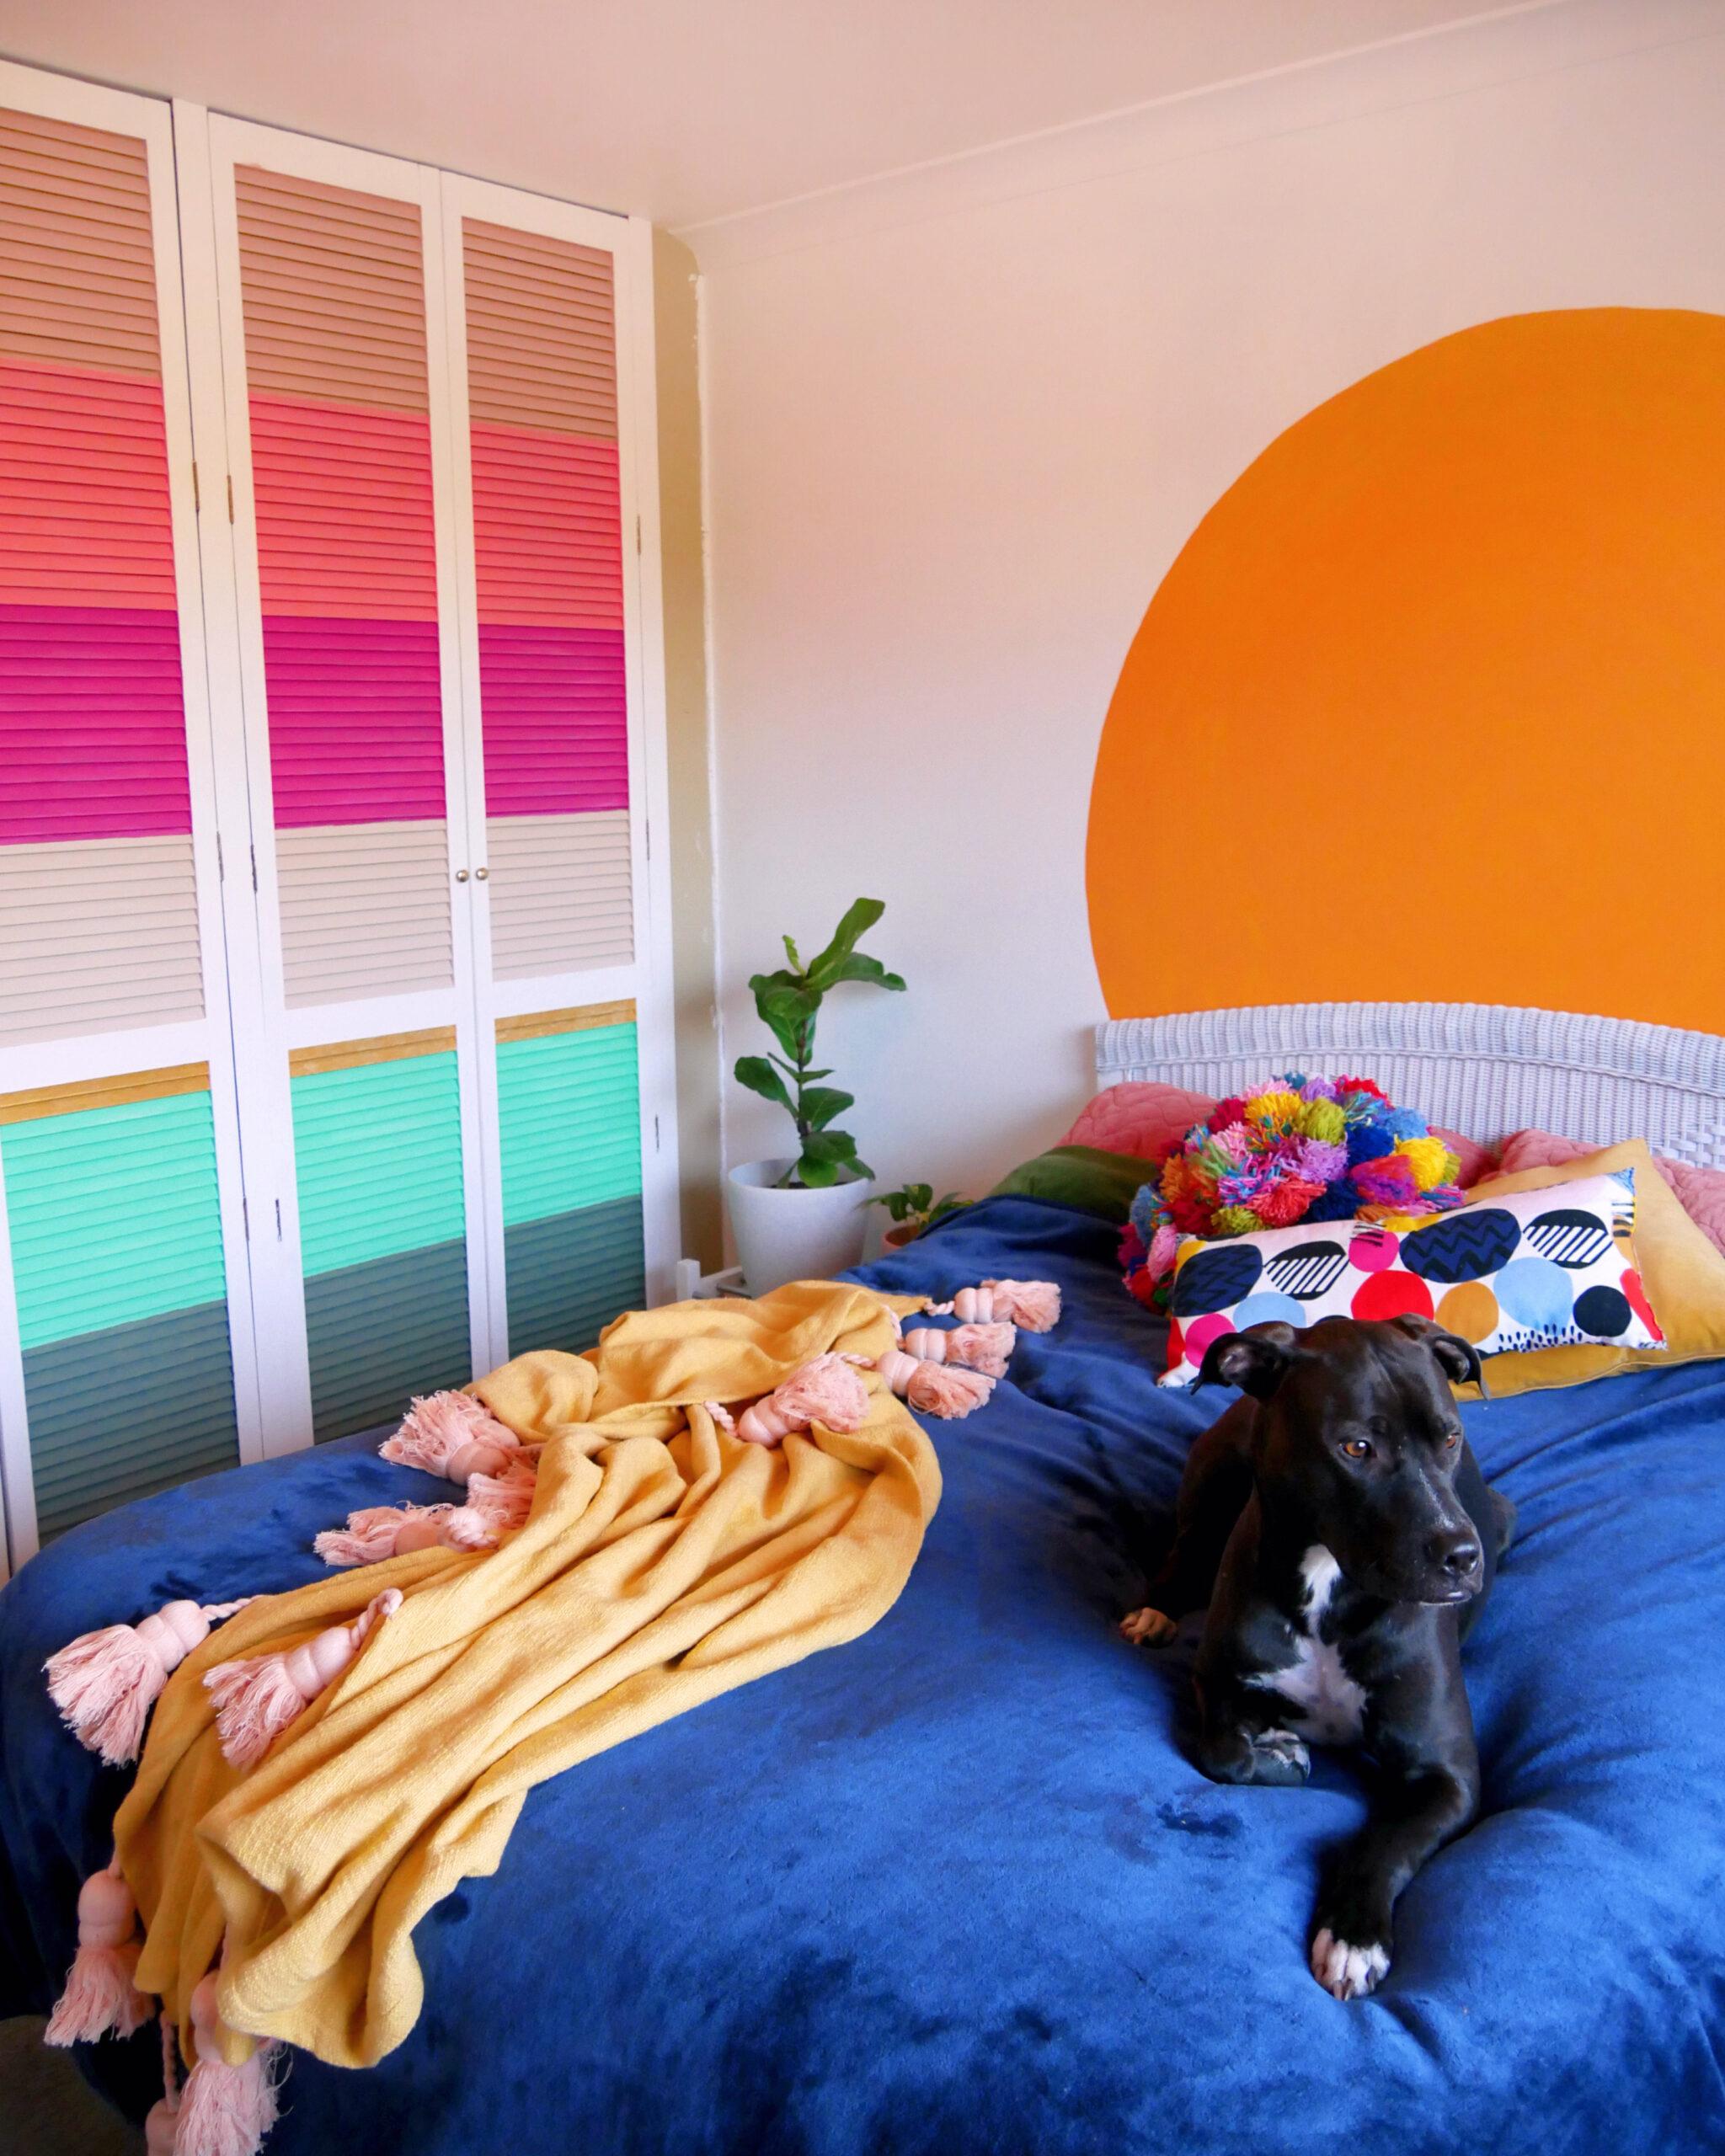 DIY Colourful Wardrobe: Home Renovation Diaries #5